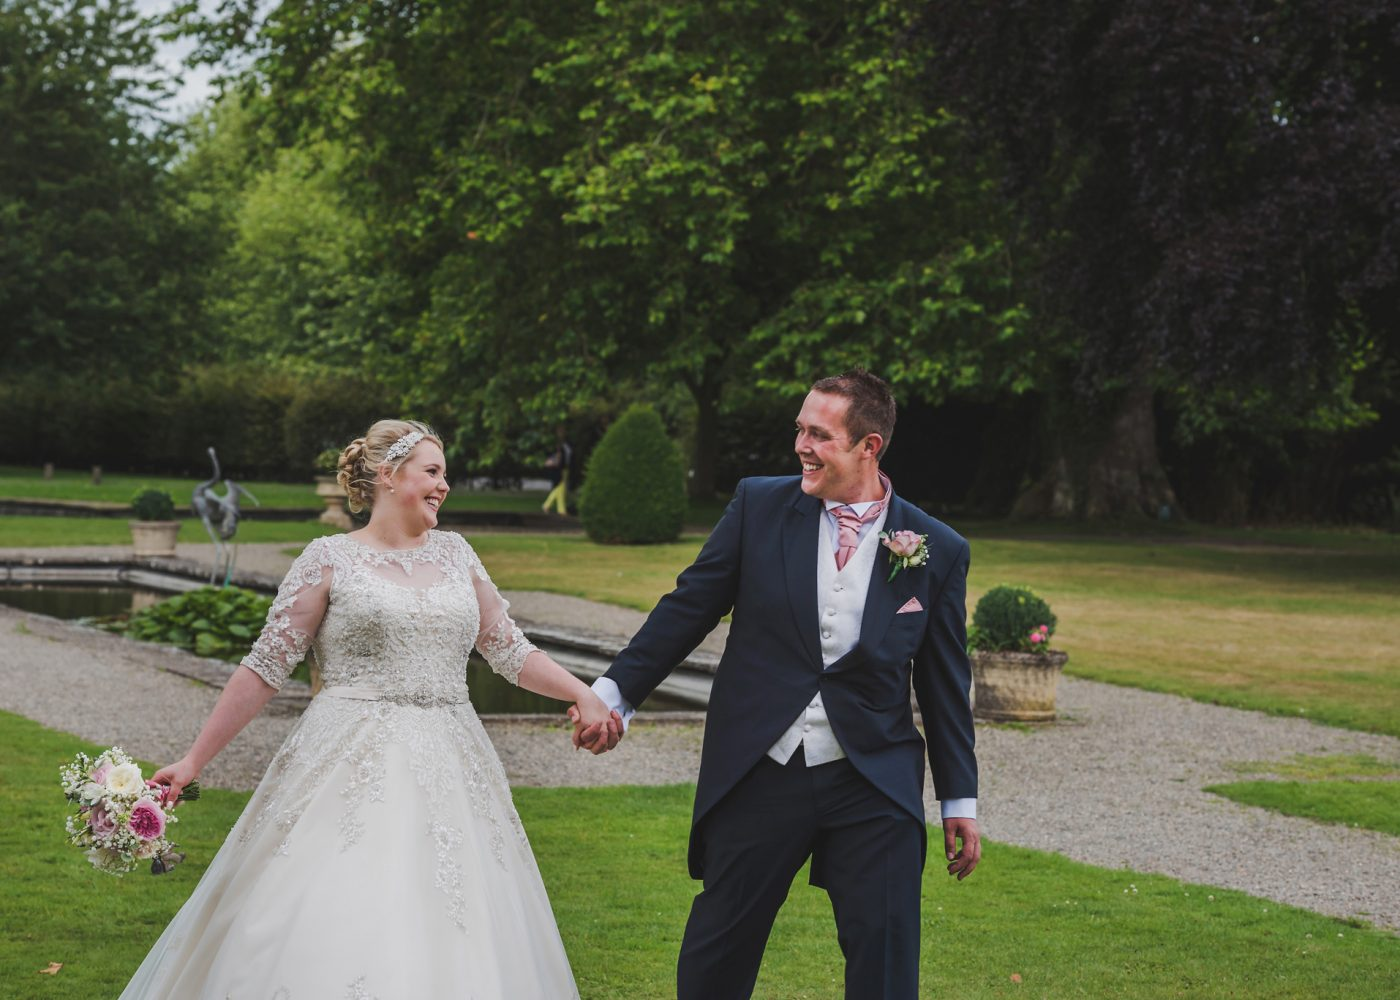 Salwey Arms wedding | Charlotte + Ben